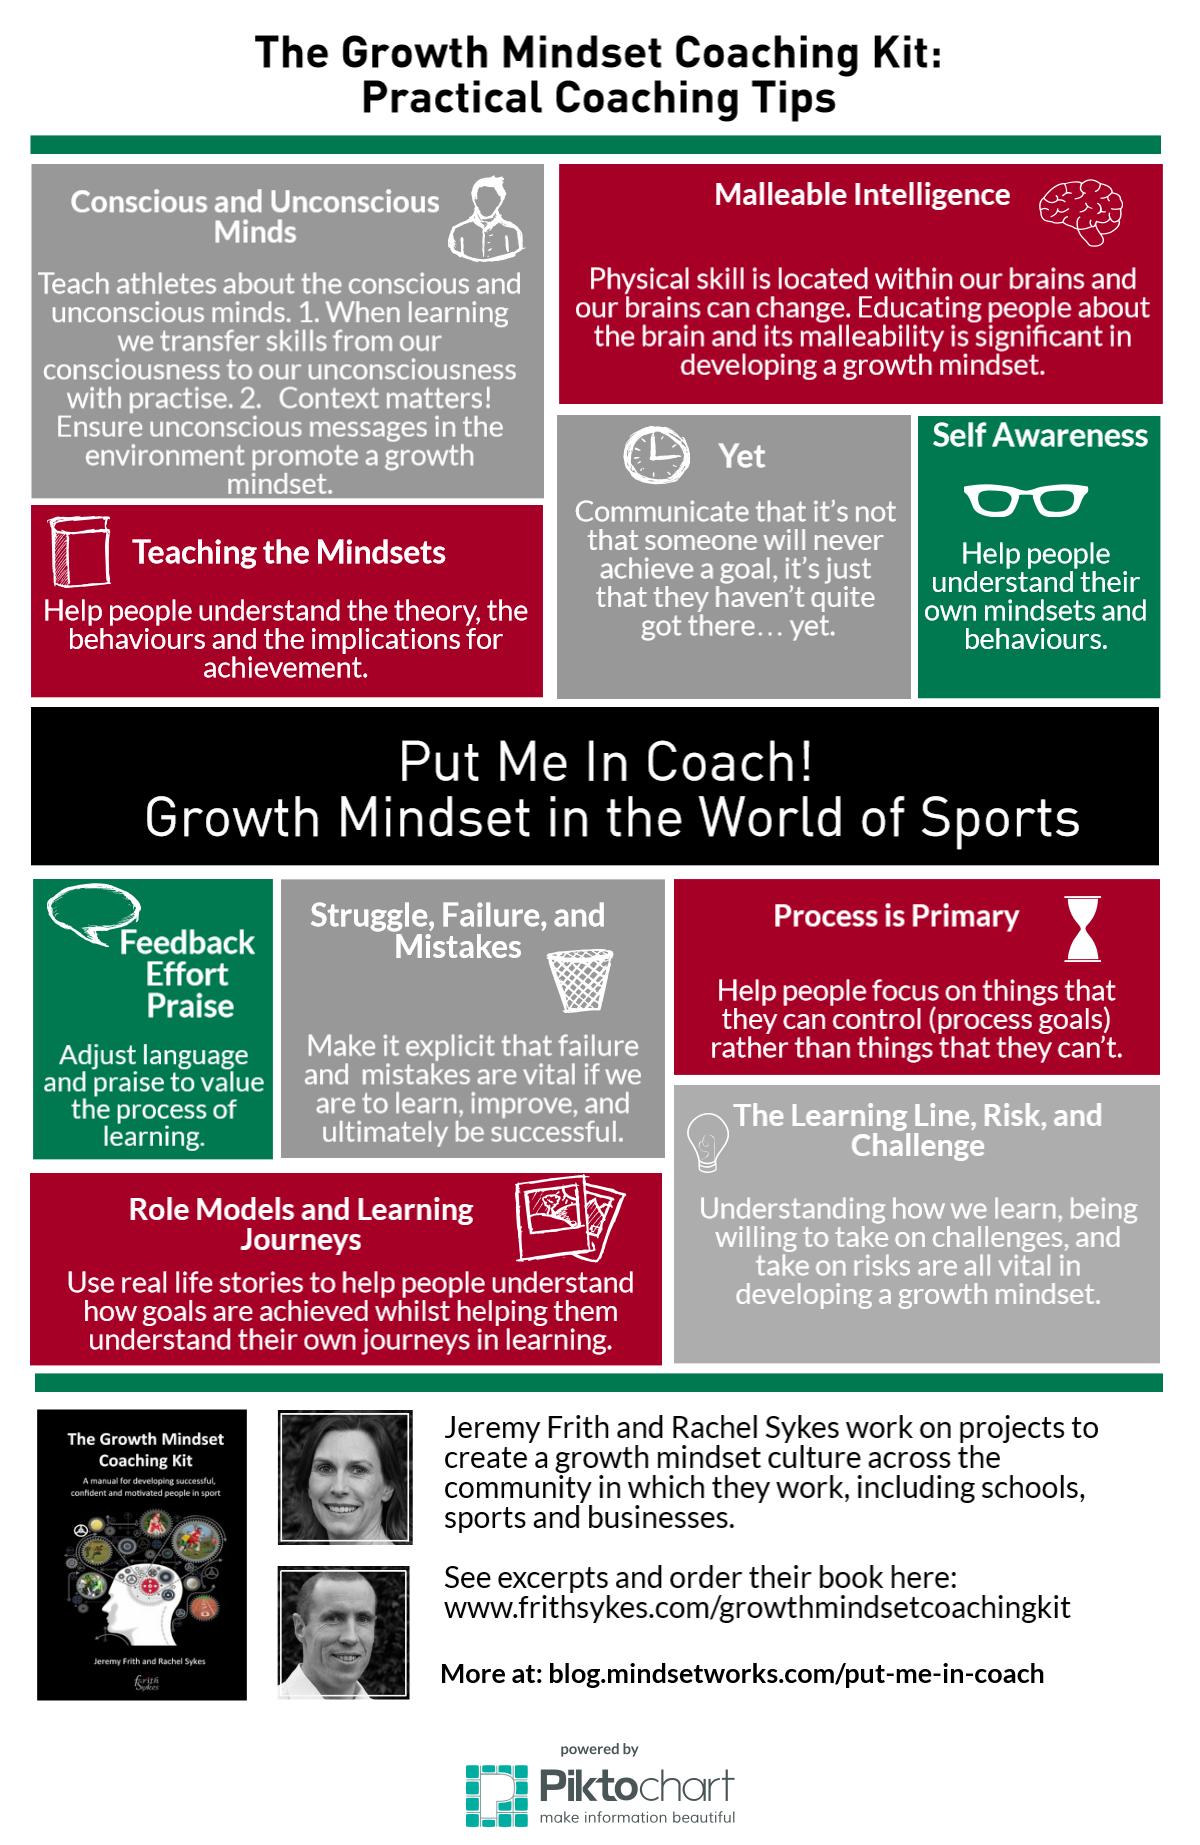 growth-mindset- 18762965 aa6c151bb98a7a123bc9587585630efd88c11fb0